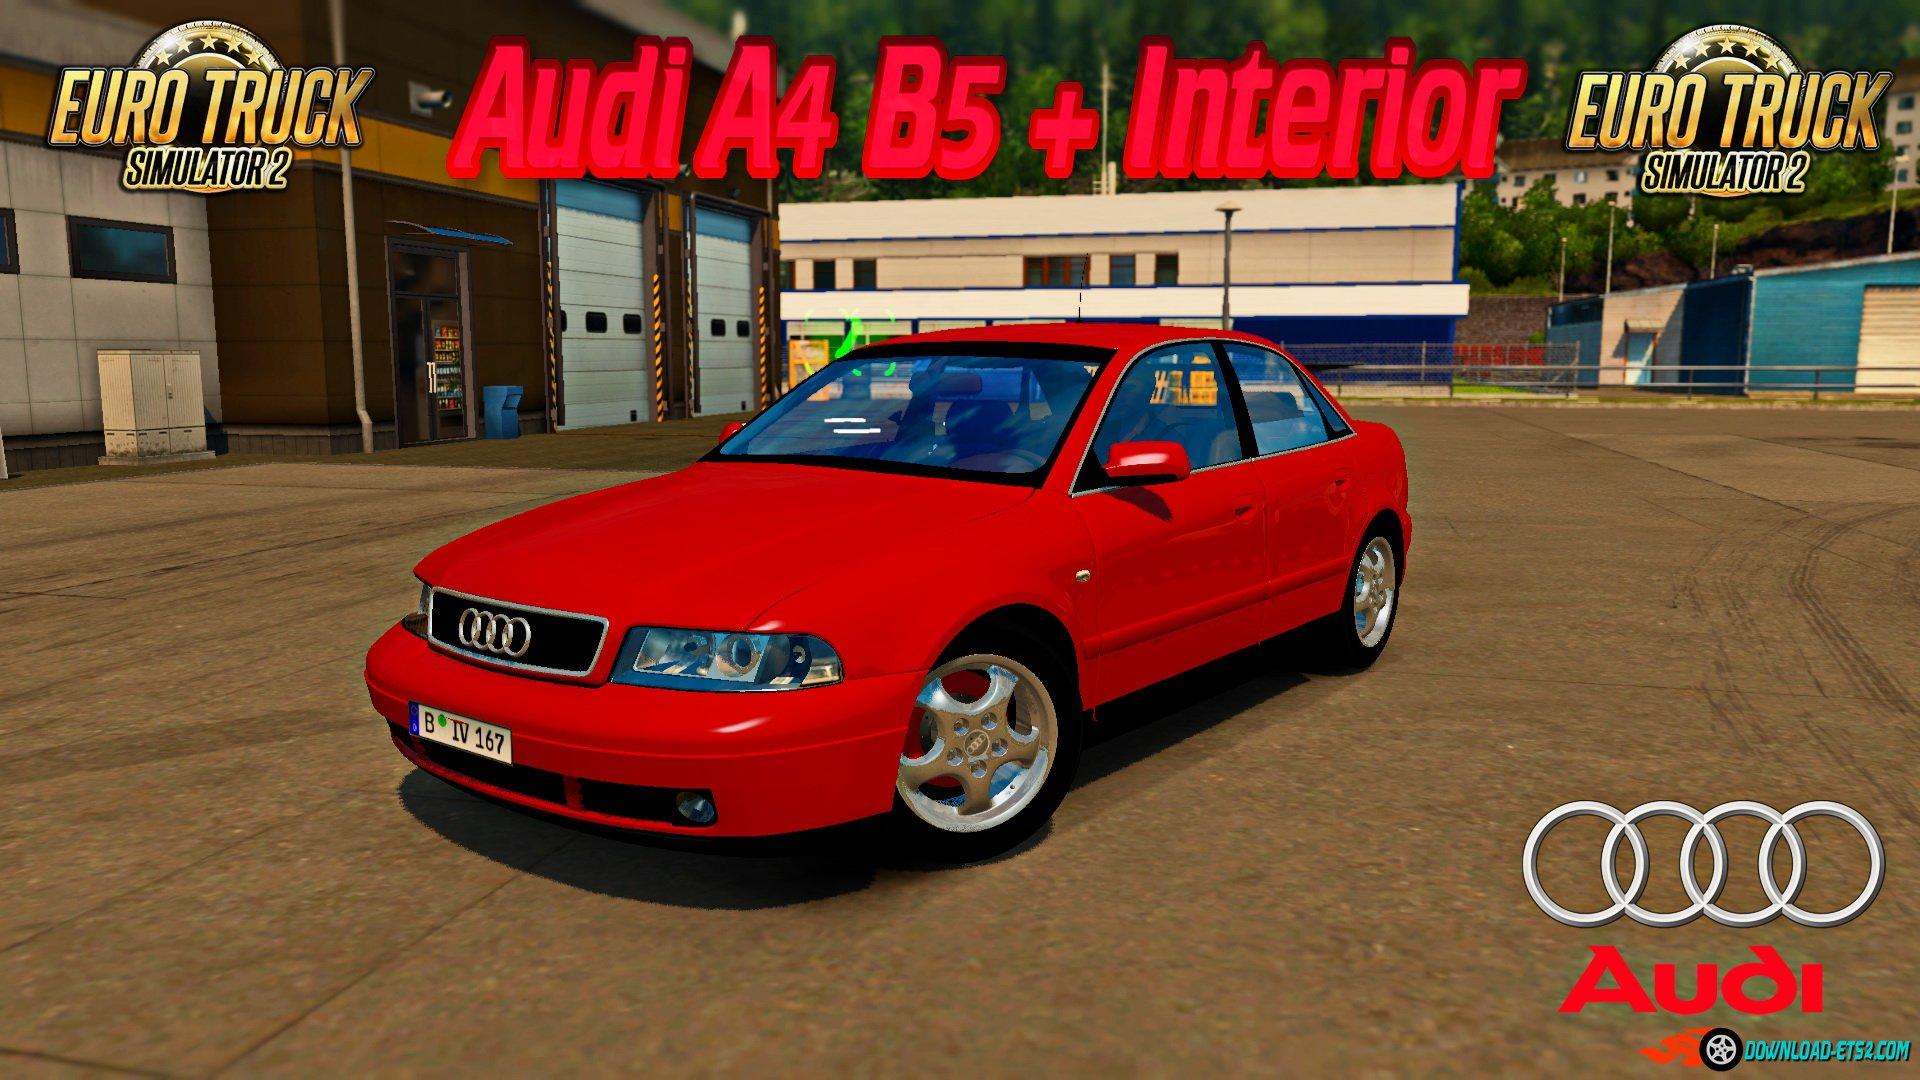 Audi A4 B5 + Interior v1.2 by Azorax Modding (1.34.x)